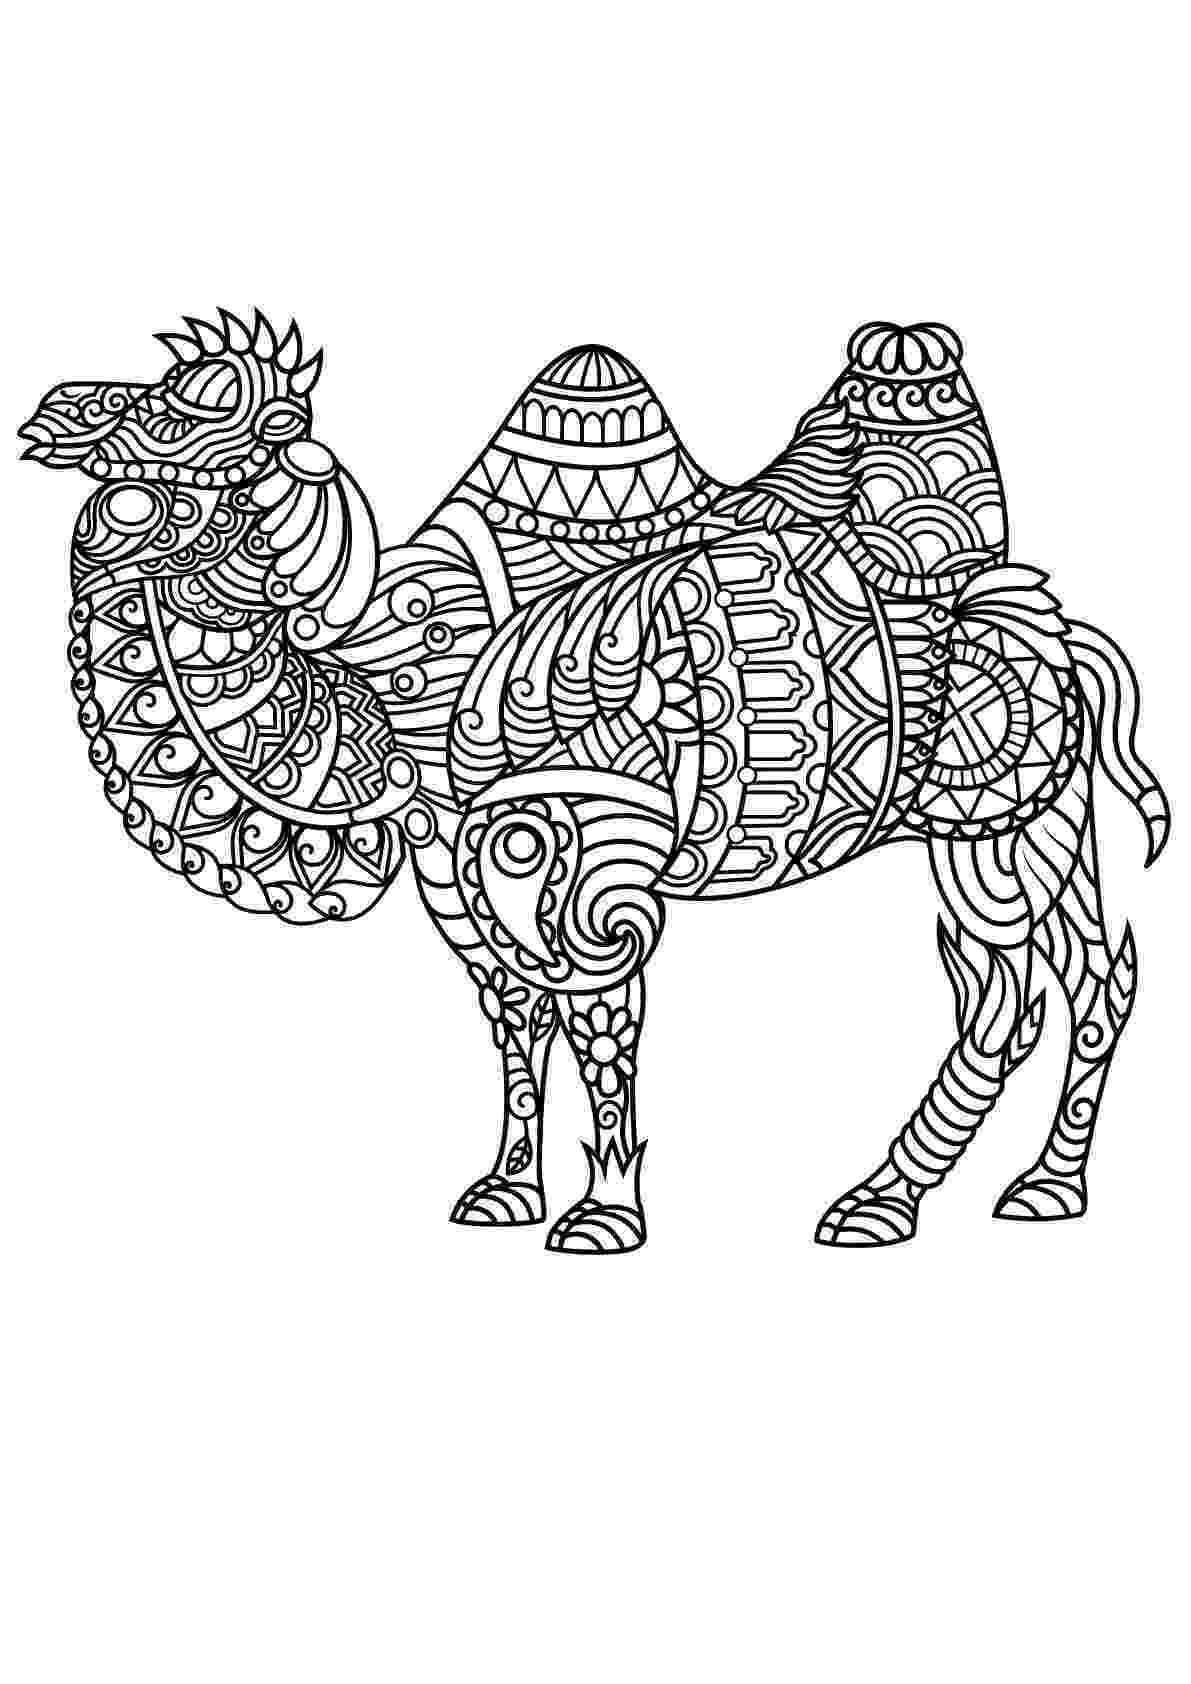 mandala animals free book camel camels dromedaries adult coloring pages animals mandala